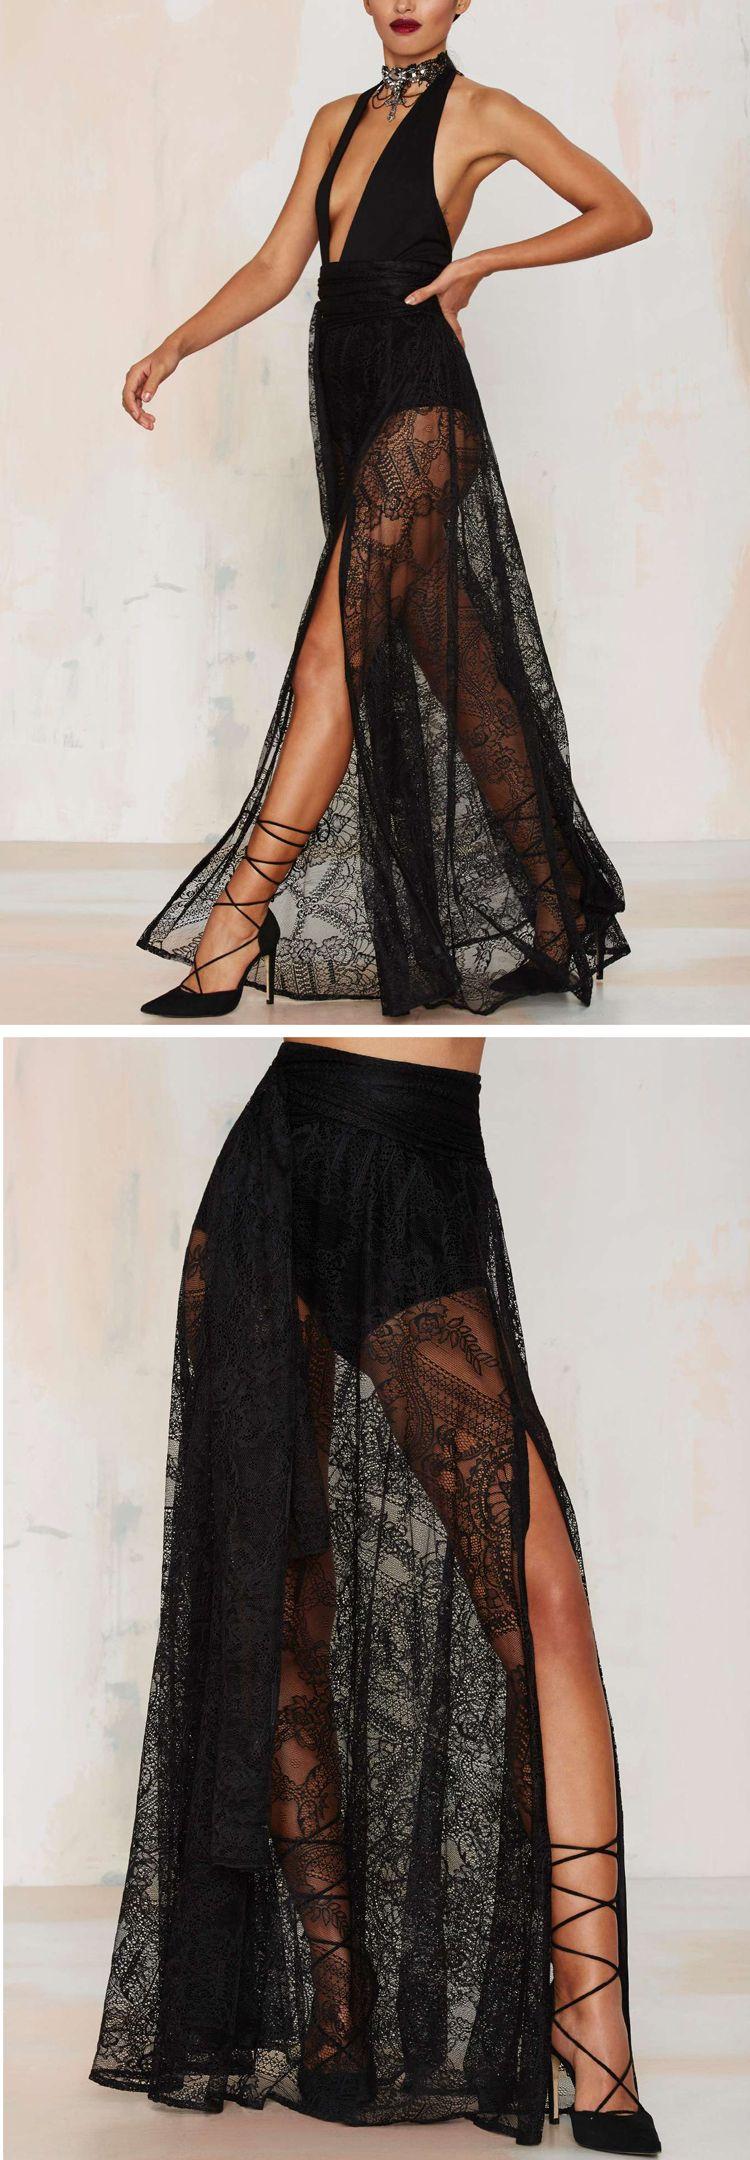 5c08d75860 Daring sheer lace maxi skirt   Style   Lace maxi, Sheer maxi skirt ...